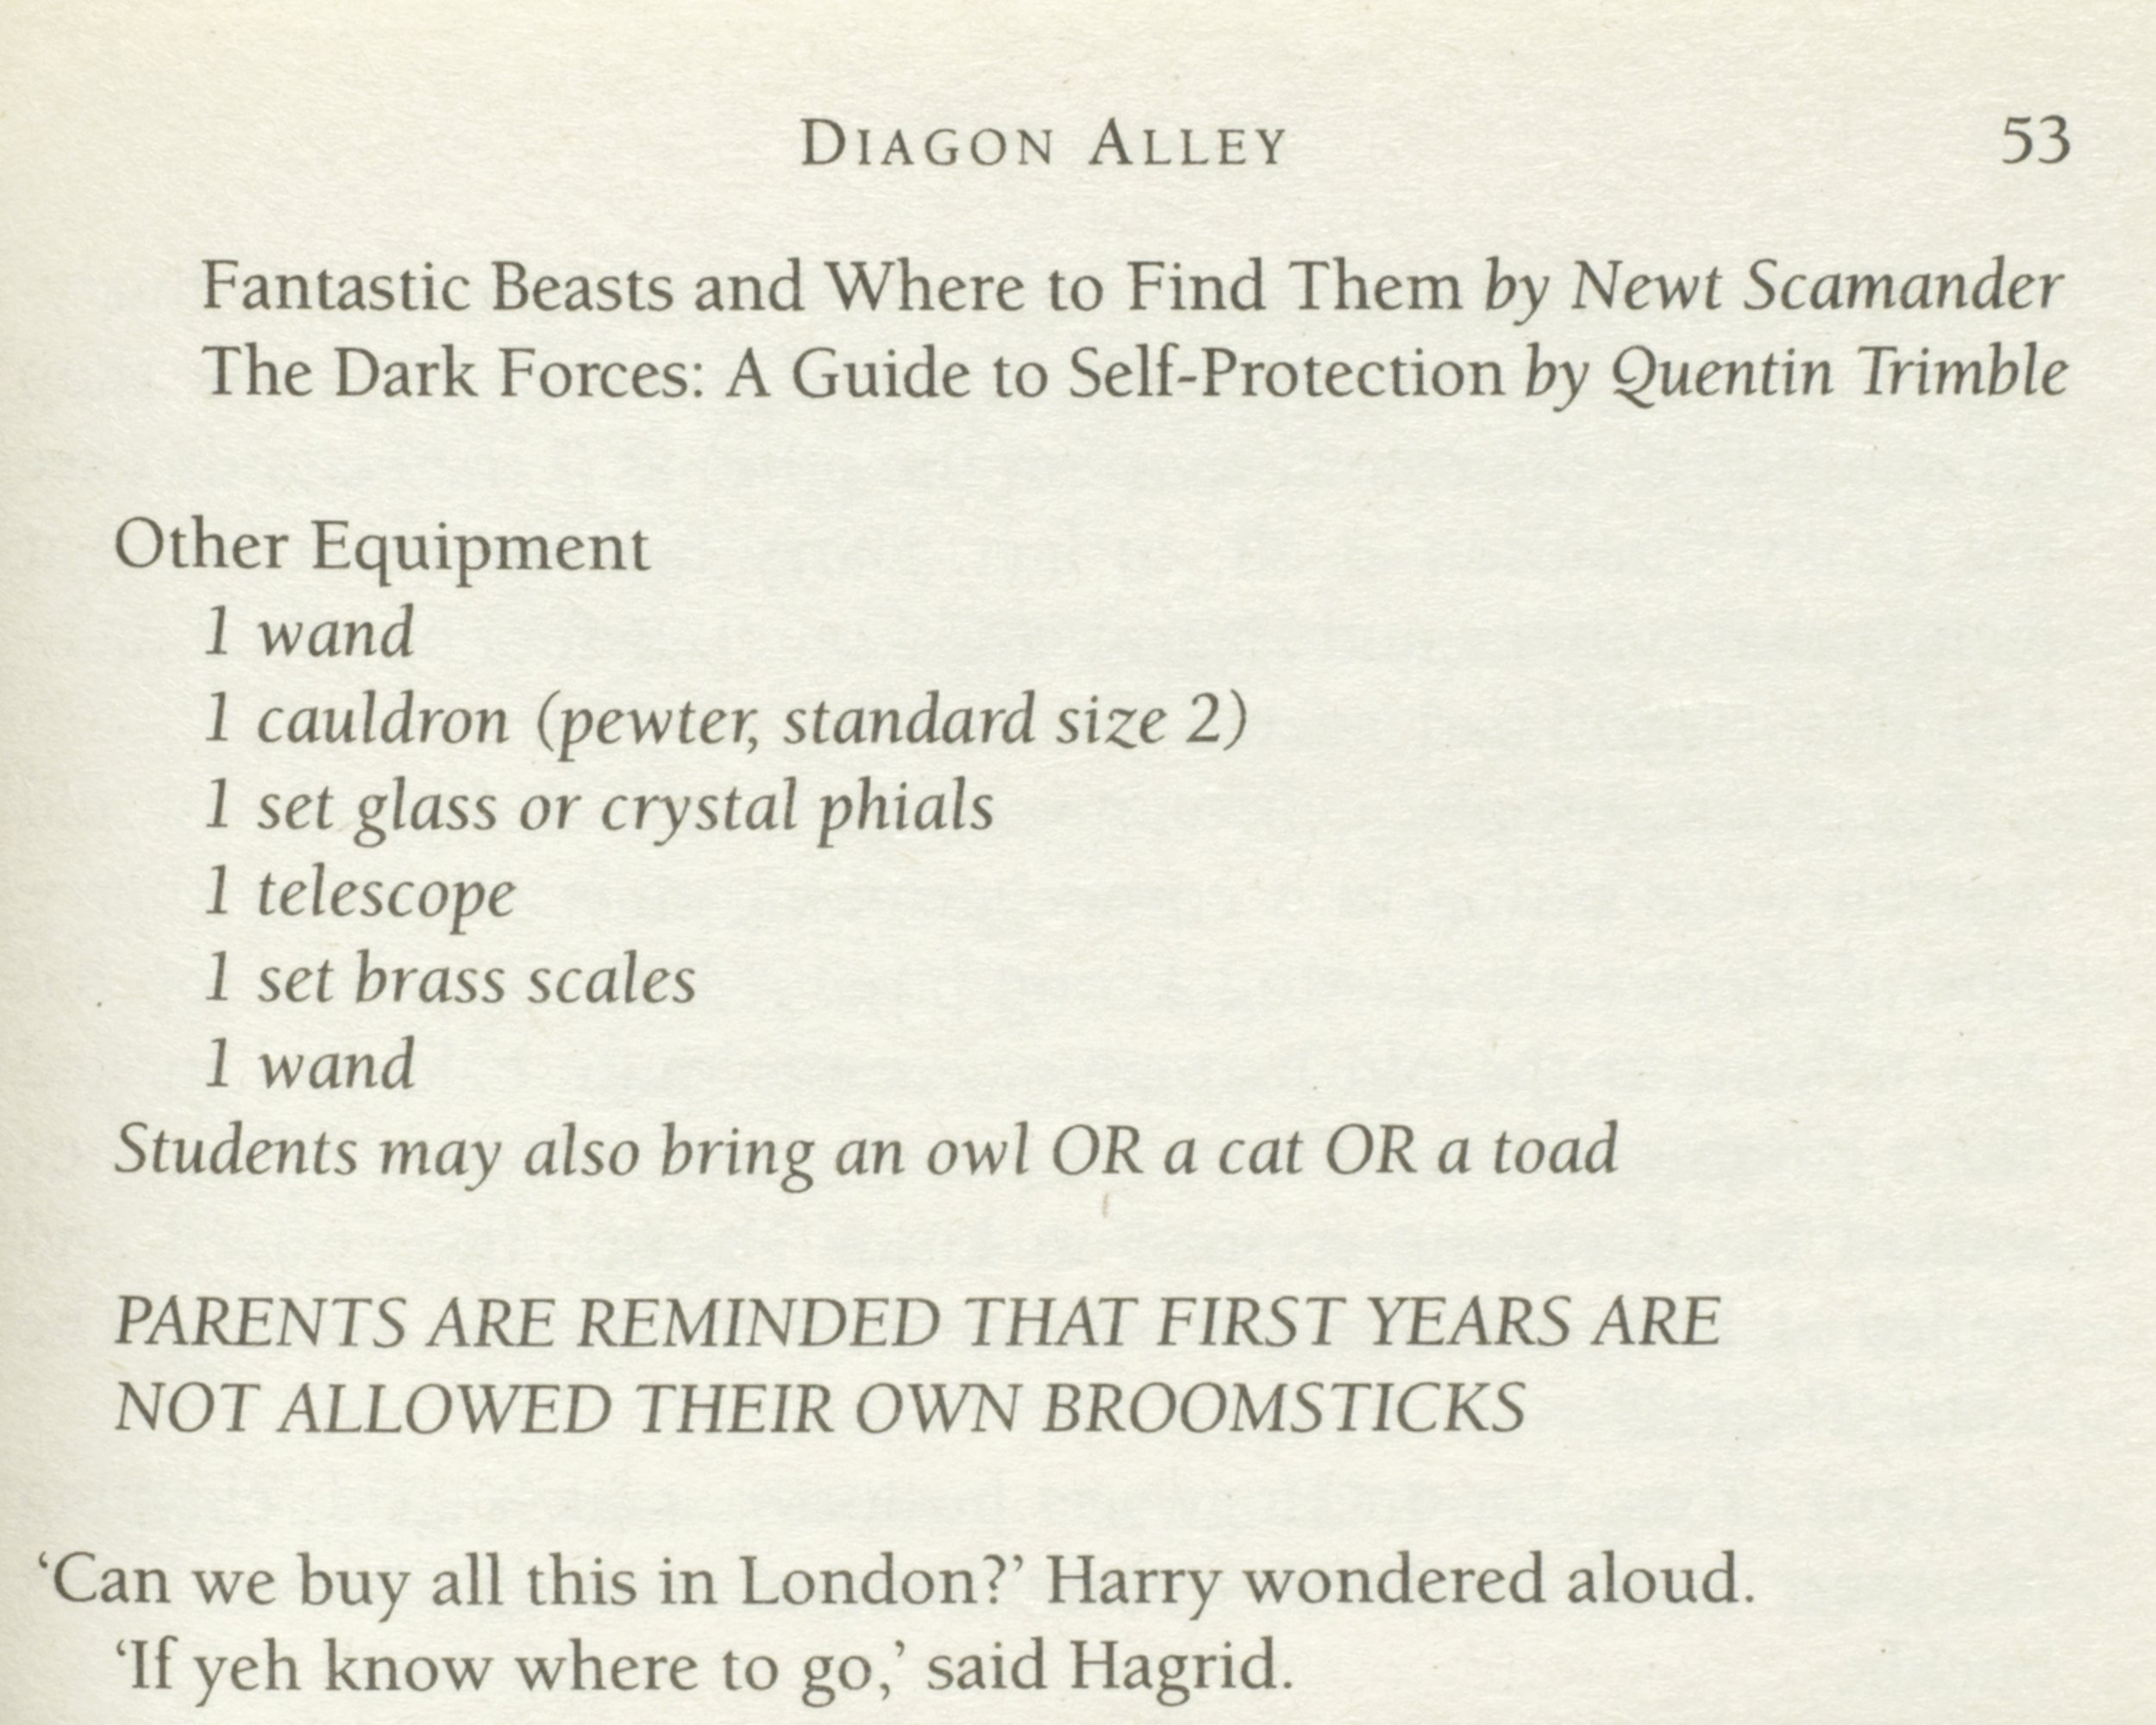 Harry Potter 1 wand